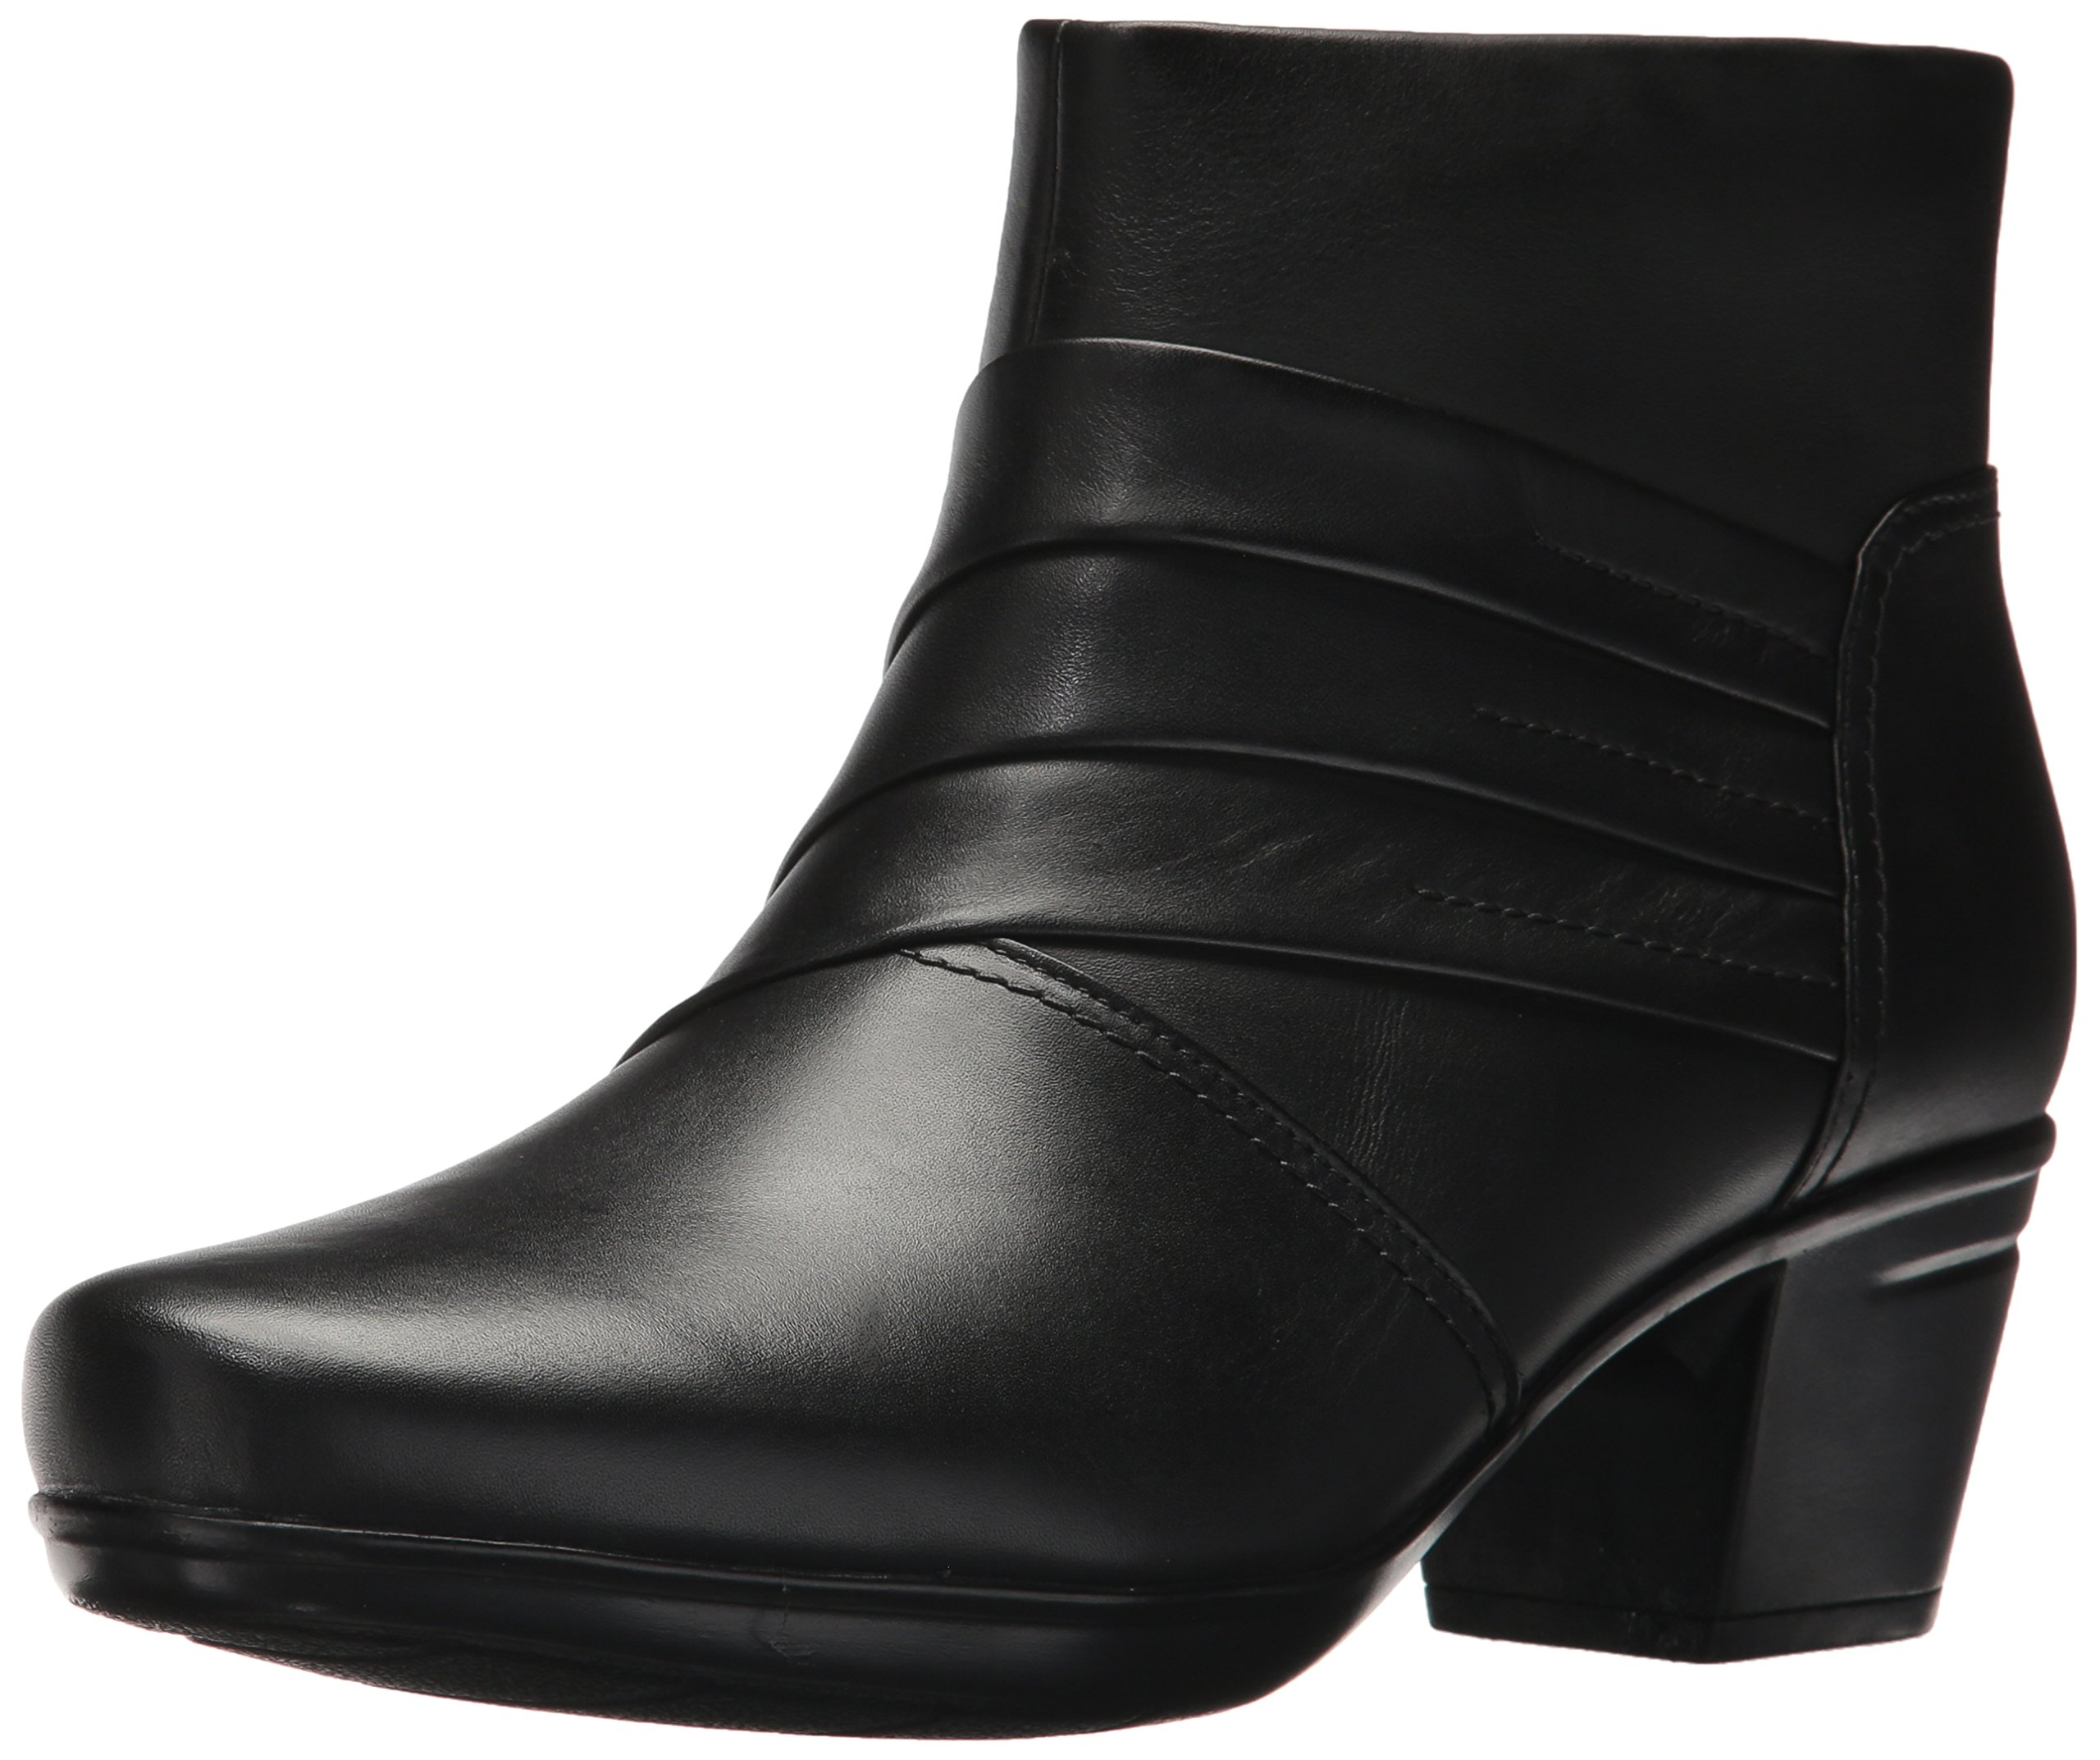 Clarks Women's Emslie Moxie Ankle Bootie, Black Leather, 9 M US